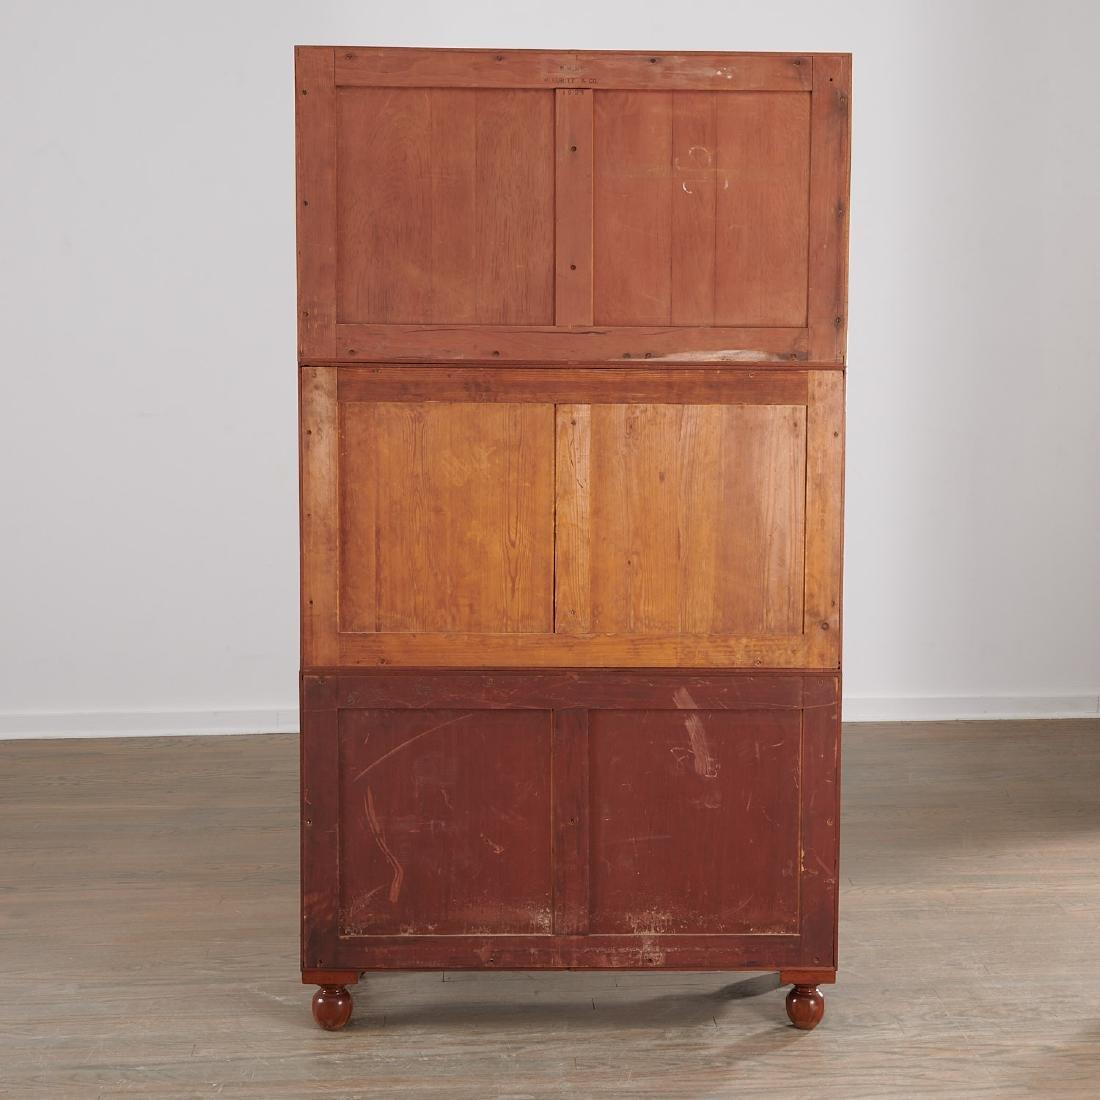 British Museum specimen cabinet by W. Cubitt & Co - 8